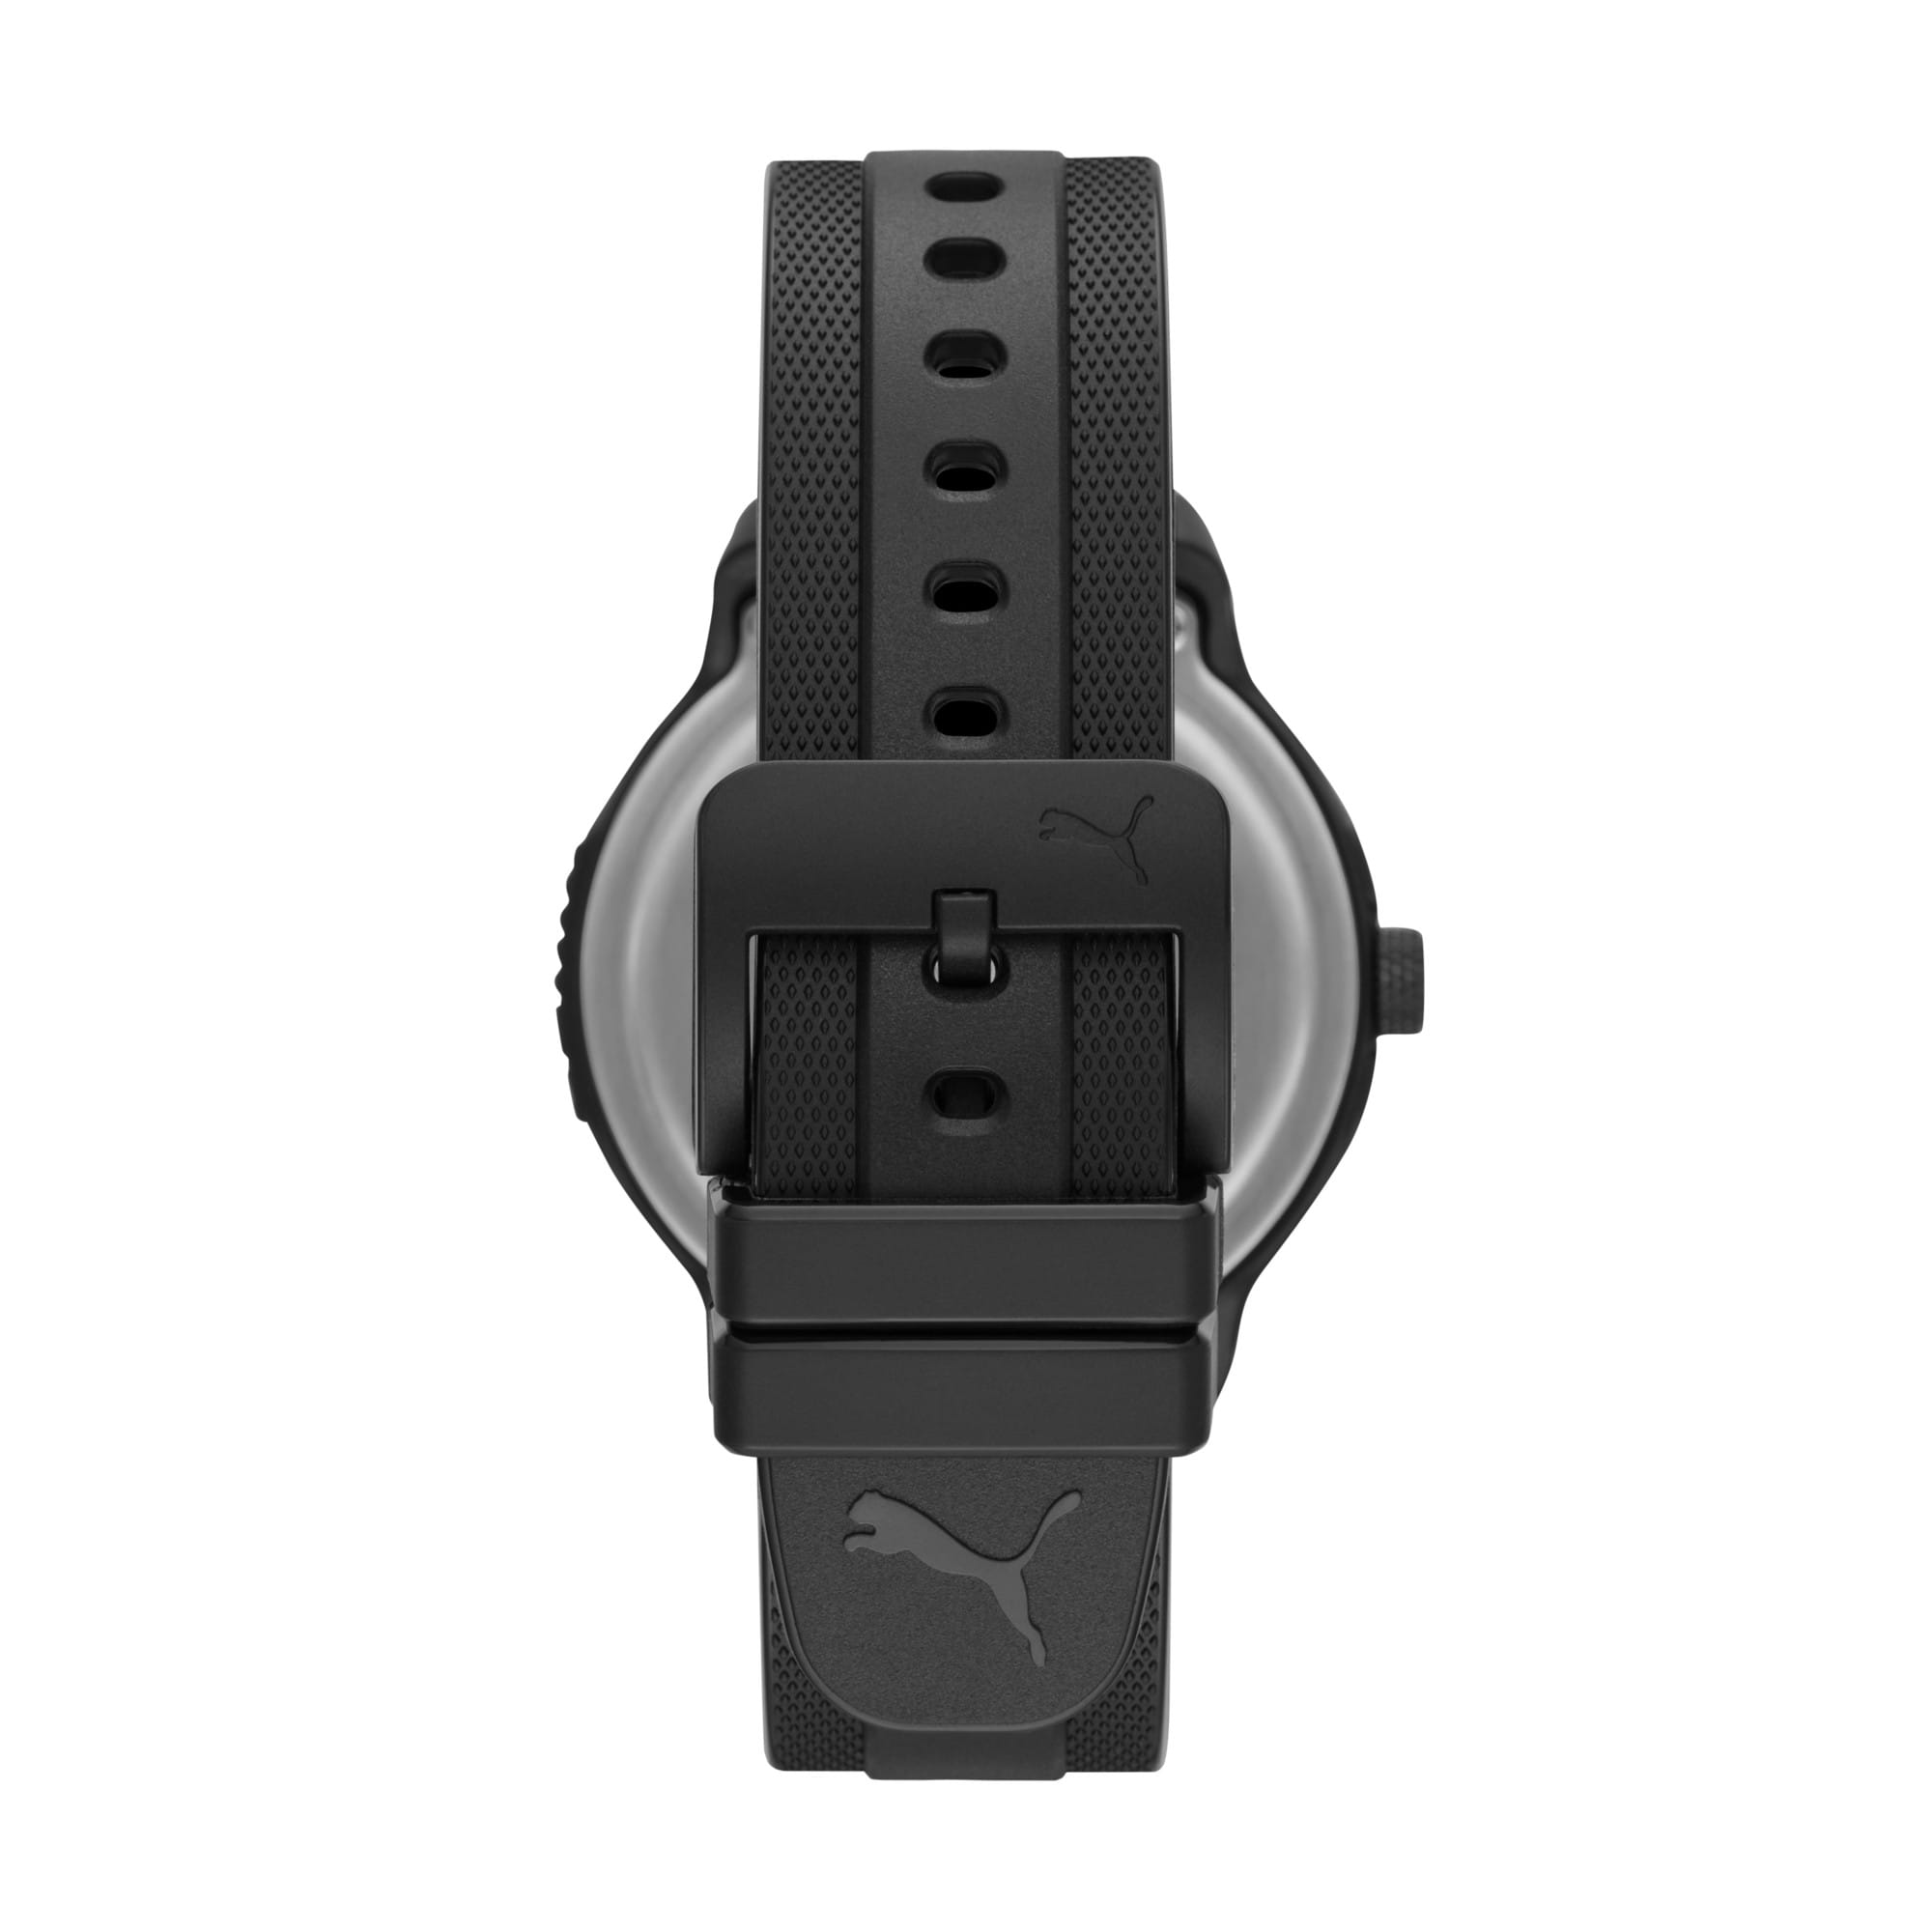 Thumbnail 3 of Reset v2 Watch, Black/Black, medium